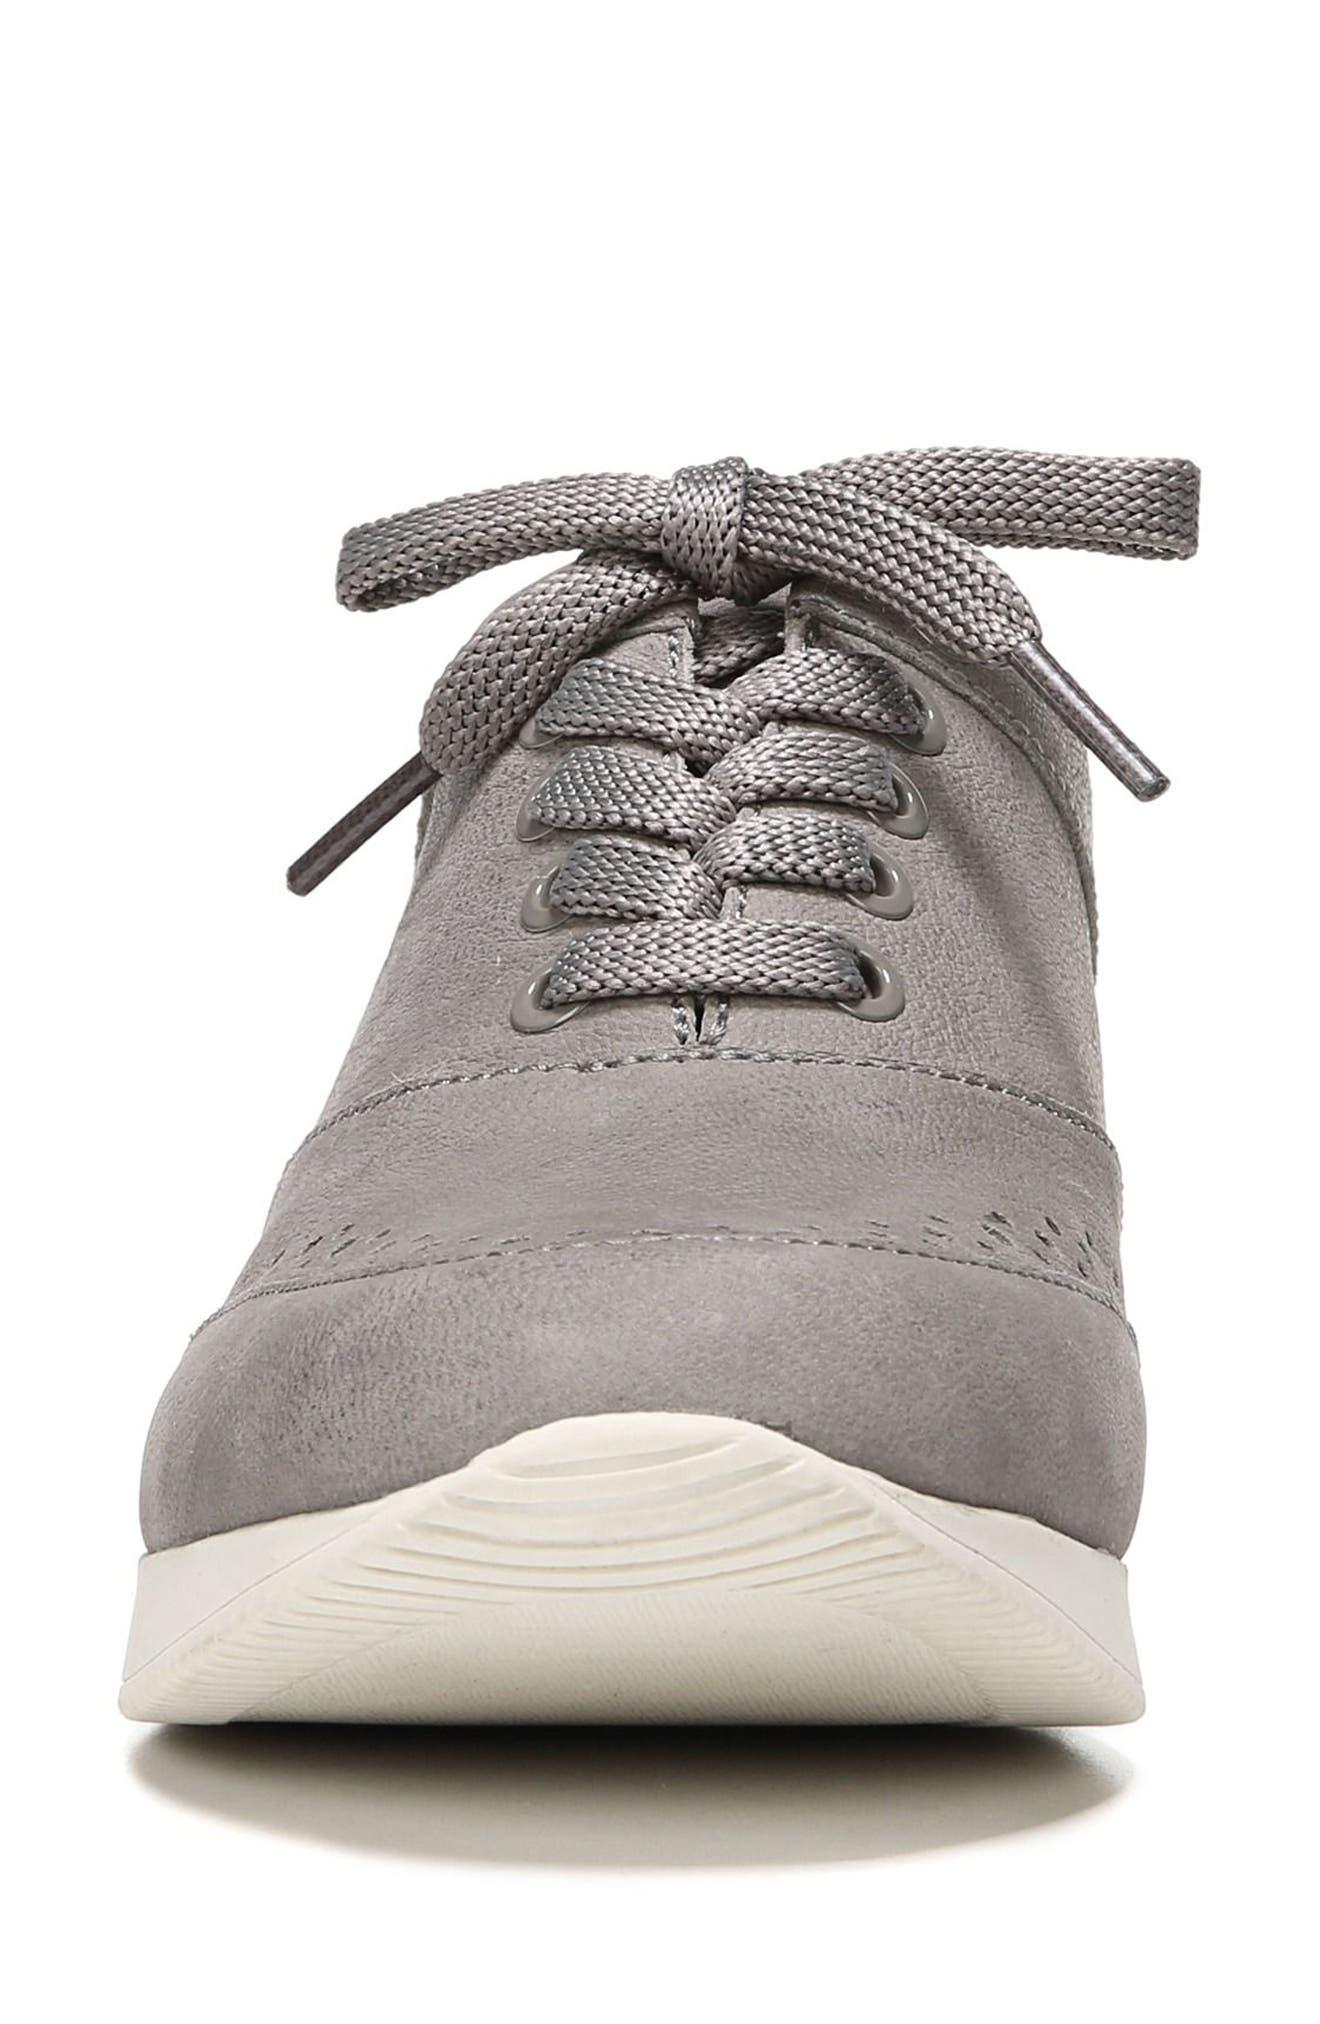 Jimi 2 Perforated Sneaker,                             Alternate thumbnail 4, color,                             Modern Grey Nubuck Leather